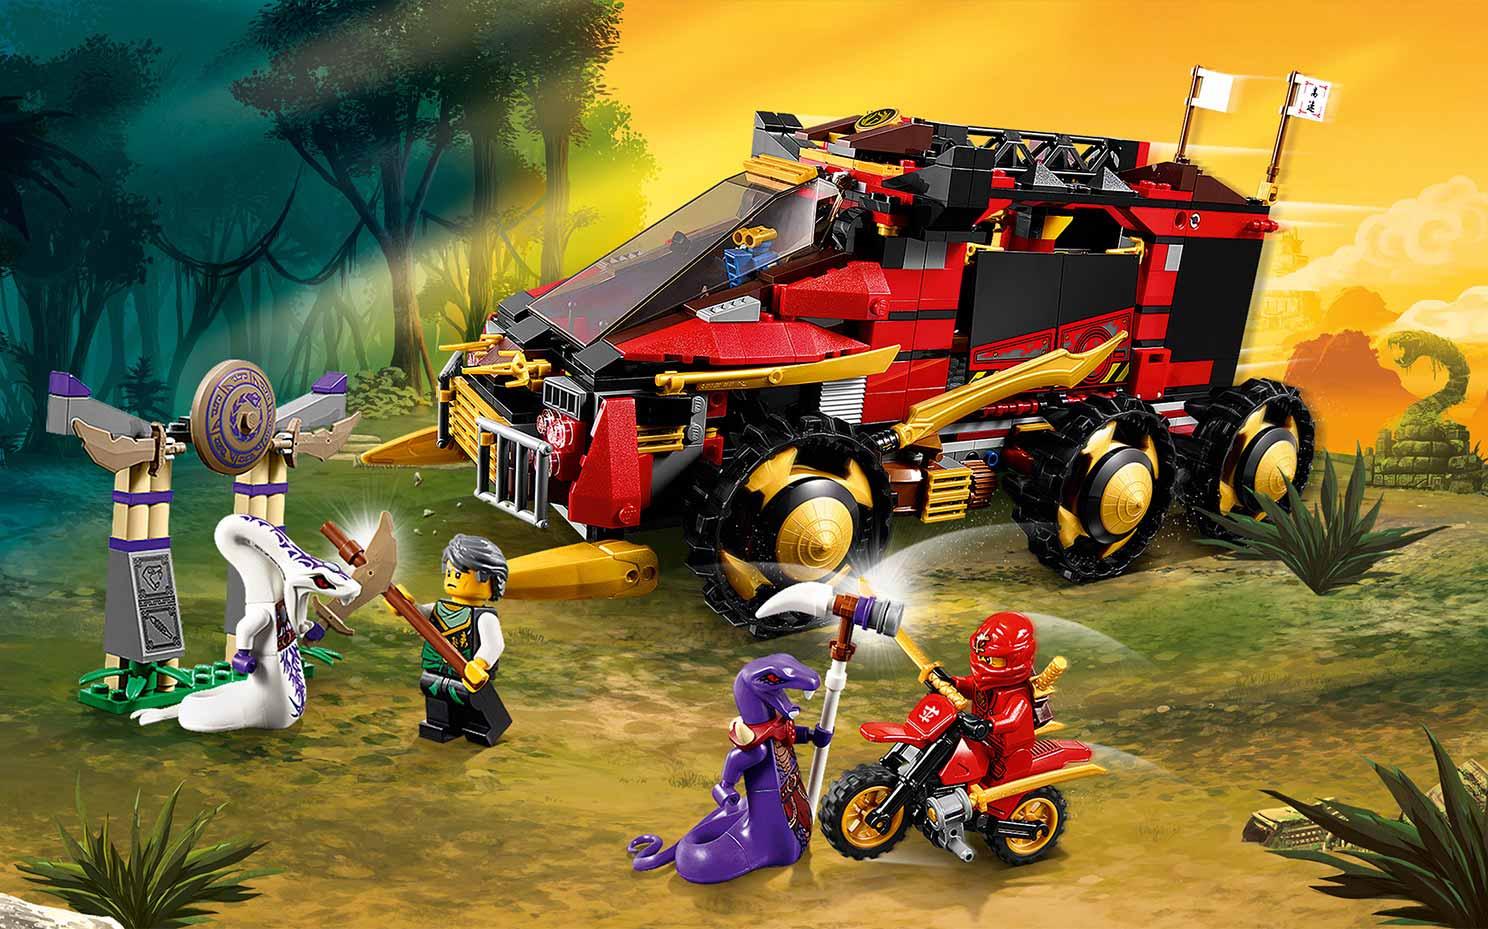 70750 la base mobile des ninjas wiki lego fandom - Lego ninjago 4 ...